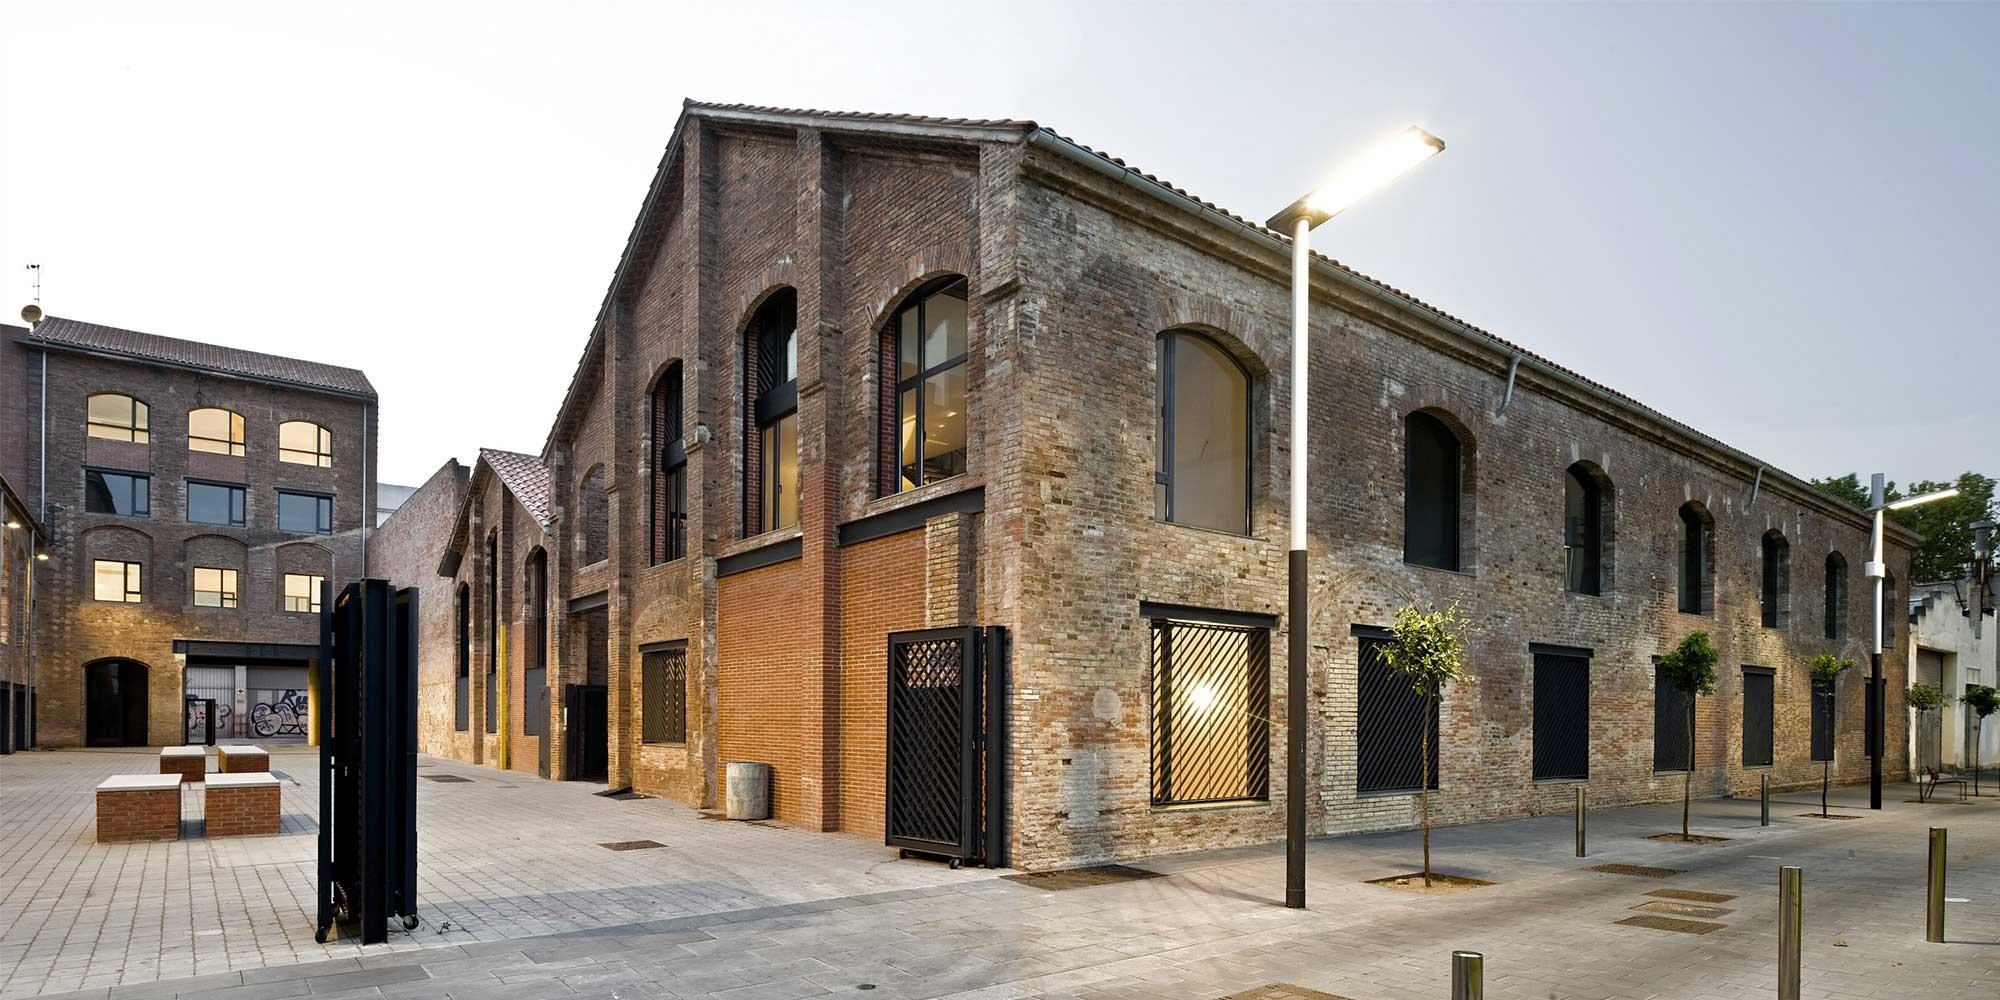 29 lofts dans une ancienne distillerie barcelone. Black Bedroom Furniture Sets. Home Design Ideas